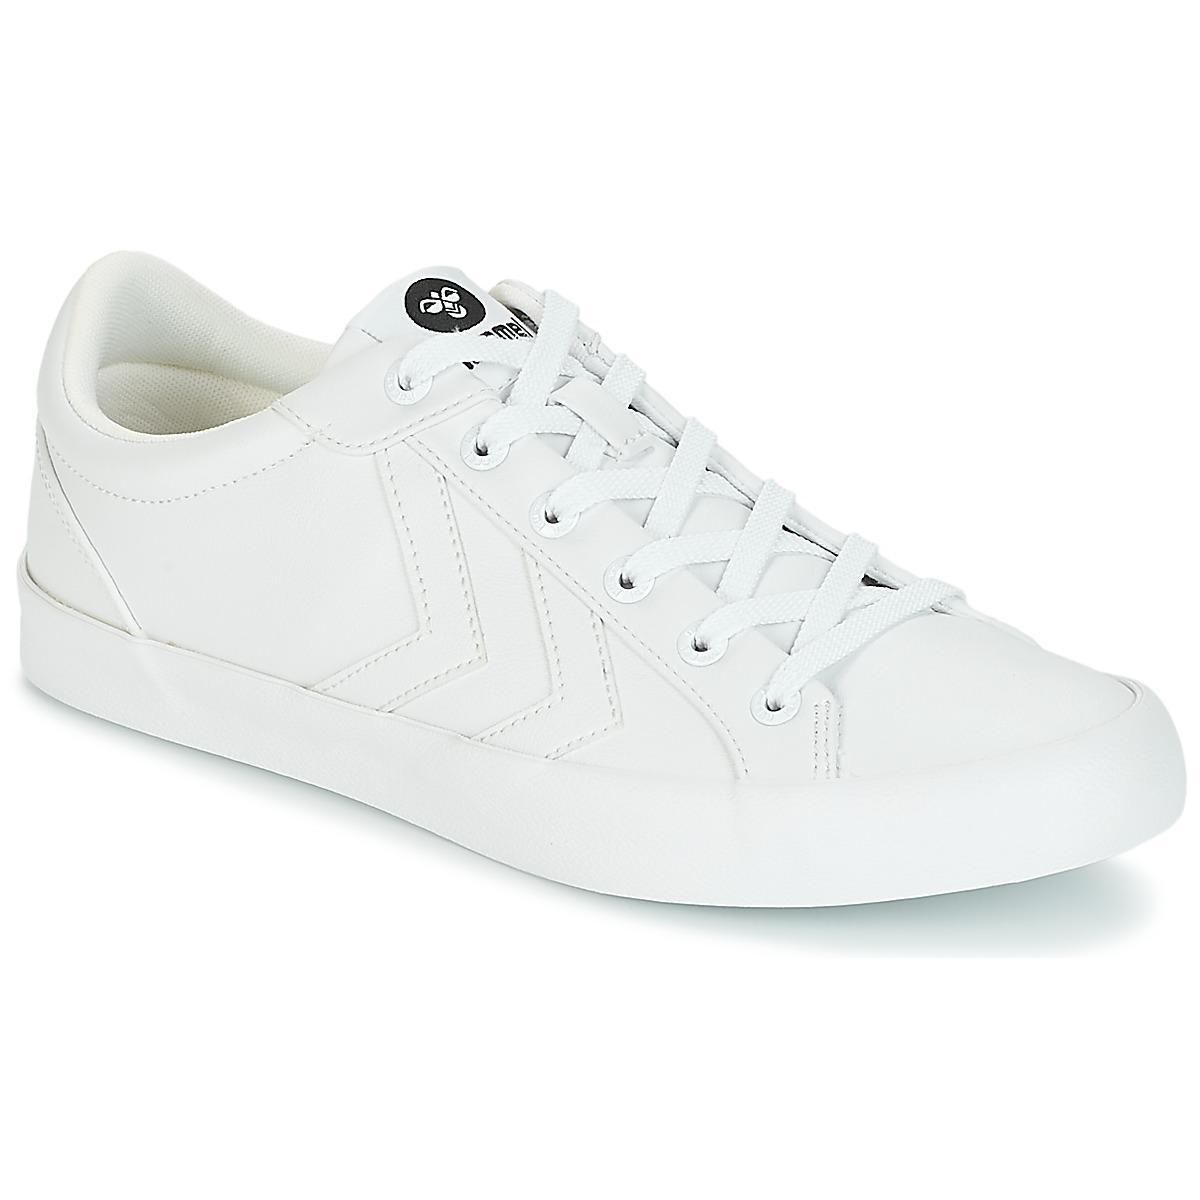 Hummel  Deuce Court Tonal Men's Shoes trainers In White